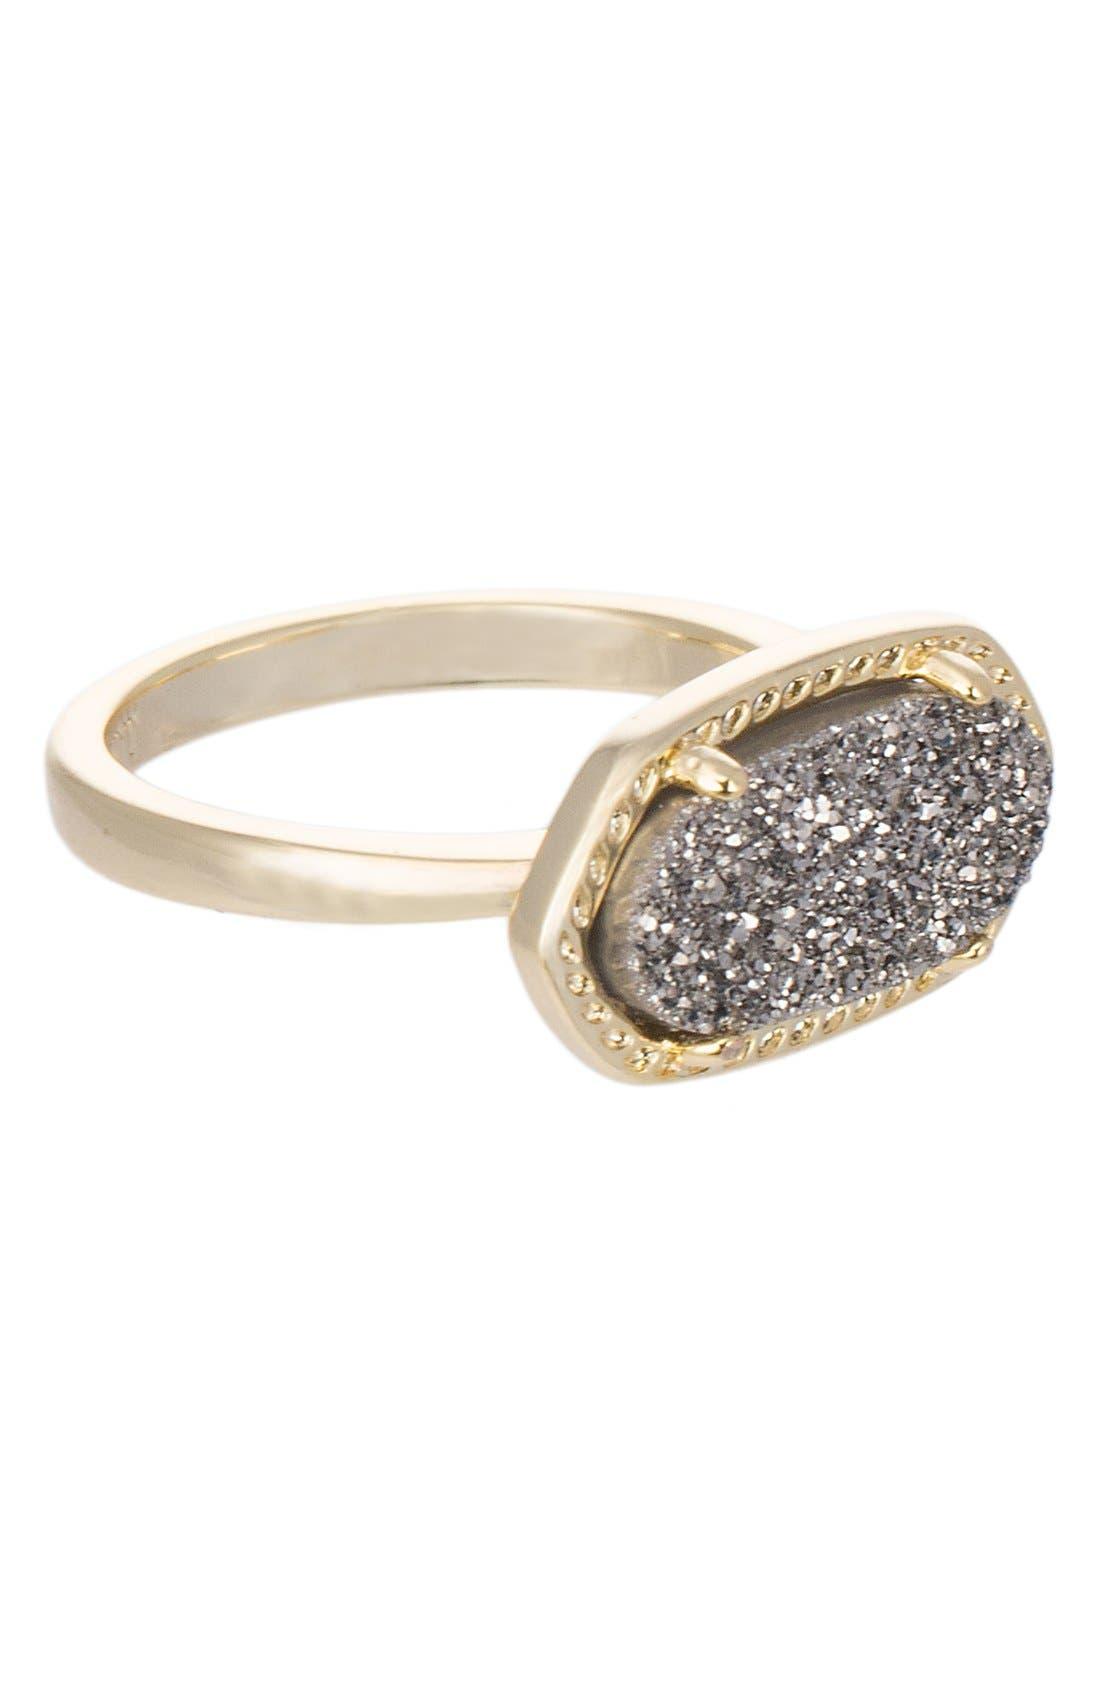 Alternate Image 1 Selected - Kendra Scott 'Ella' Drusy Ring